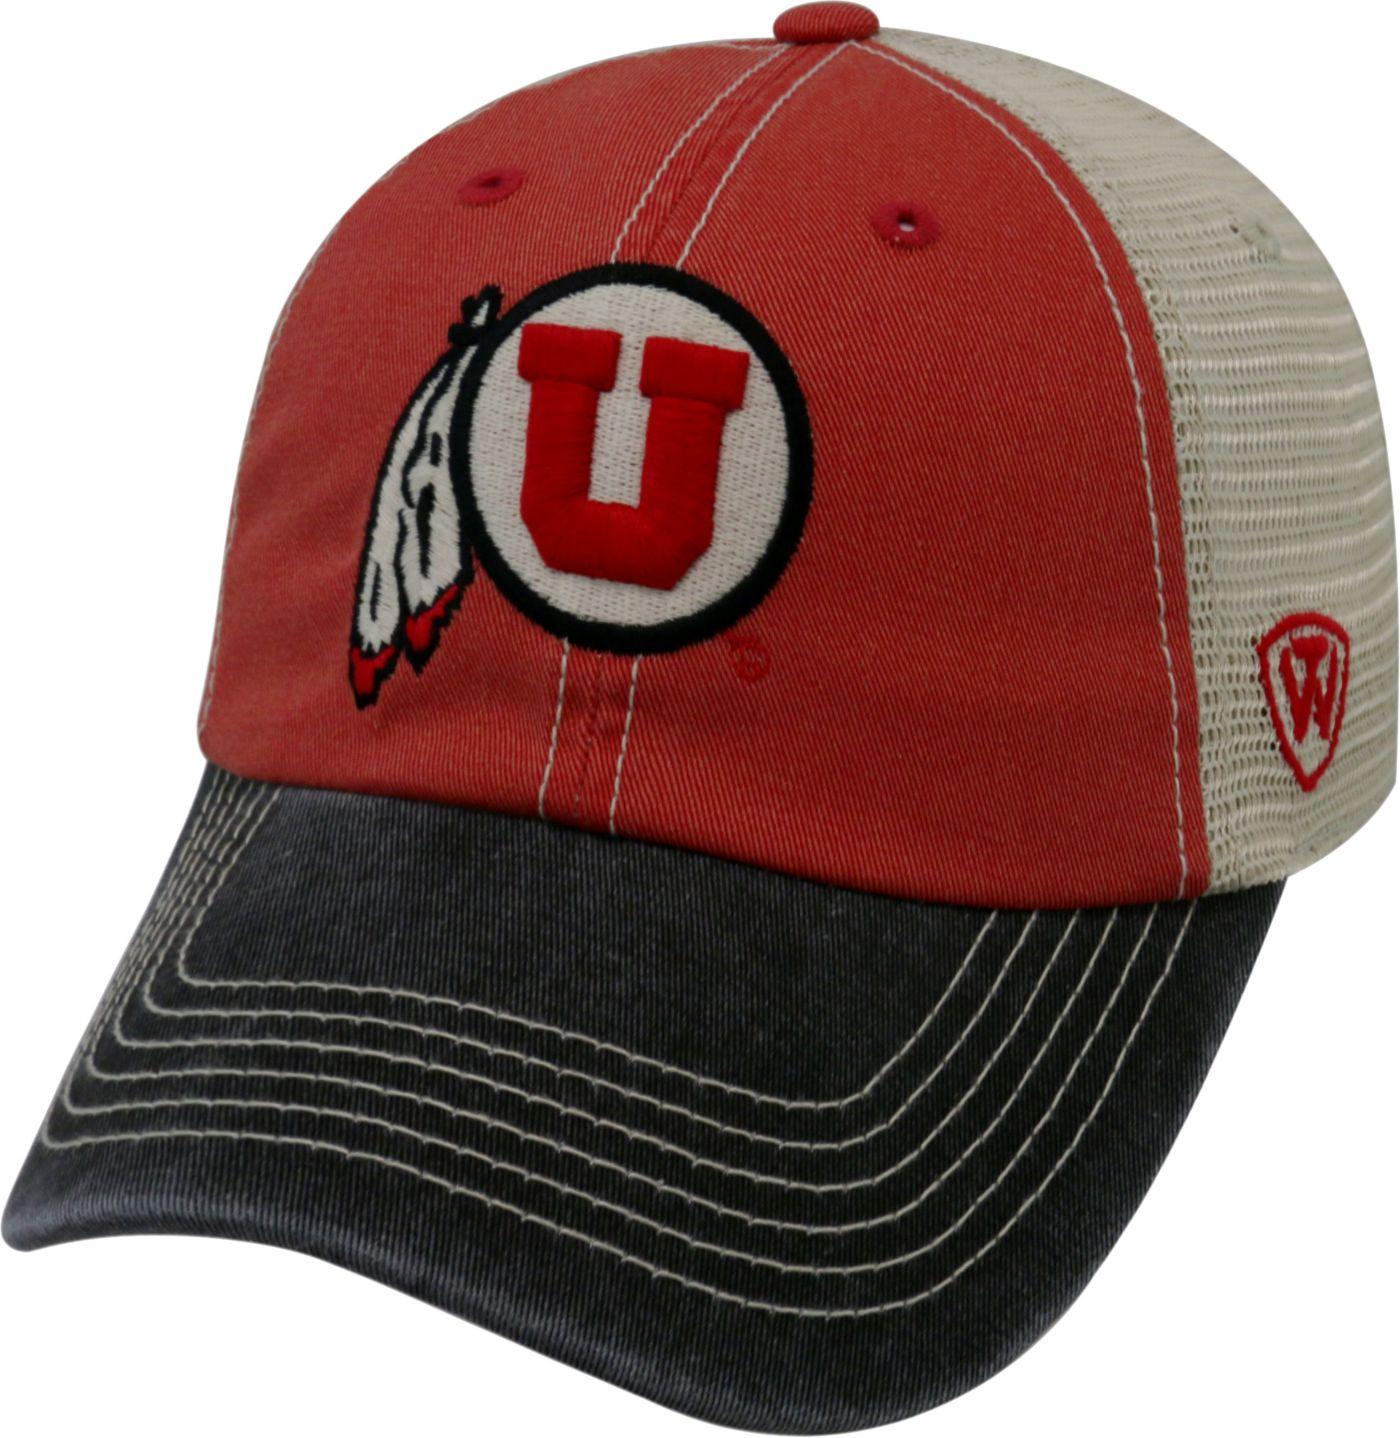 Top of the World Men's Utah Utes Crimson/White/Black Off Road Adjustable Hat